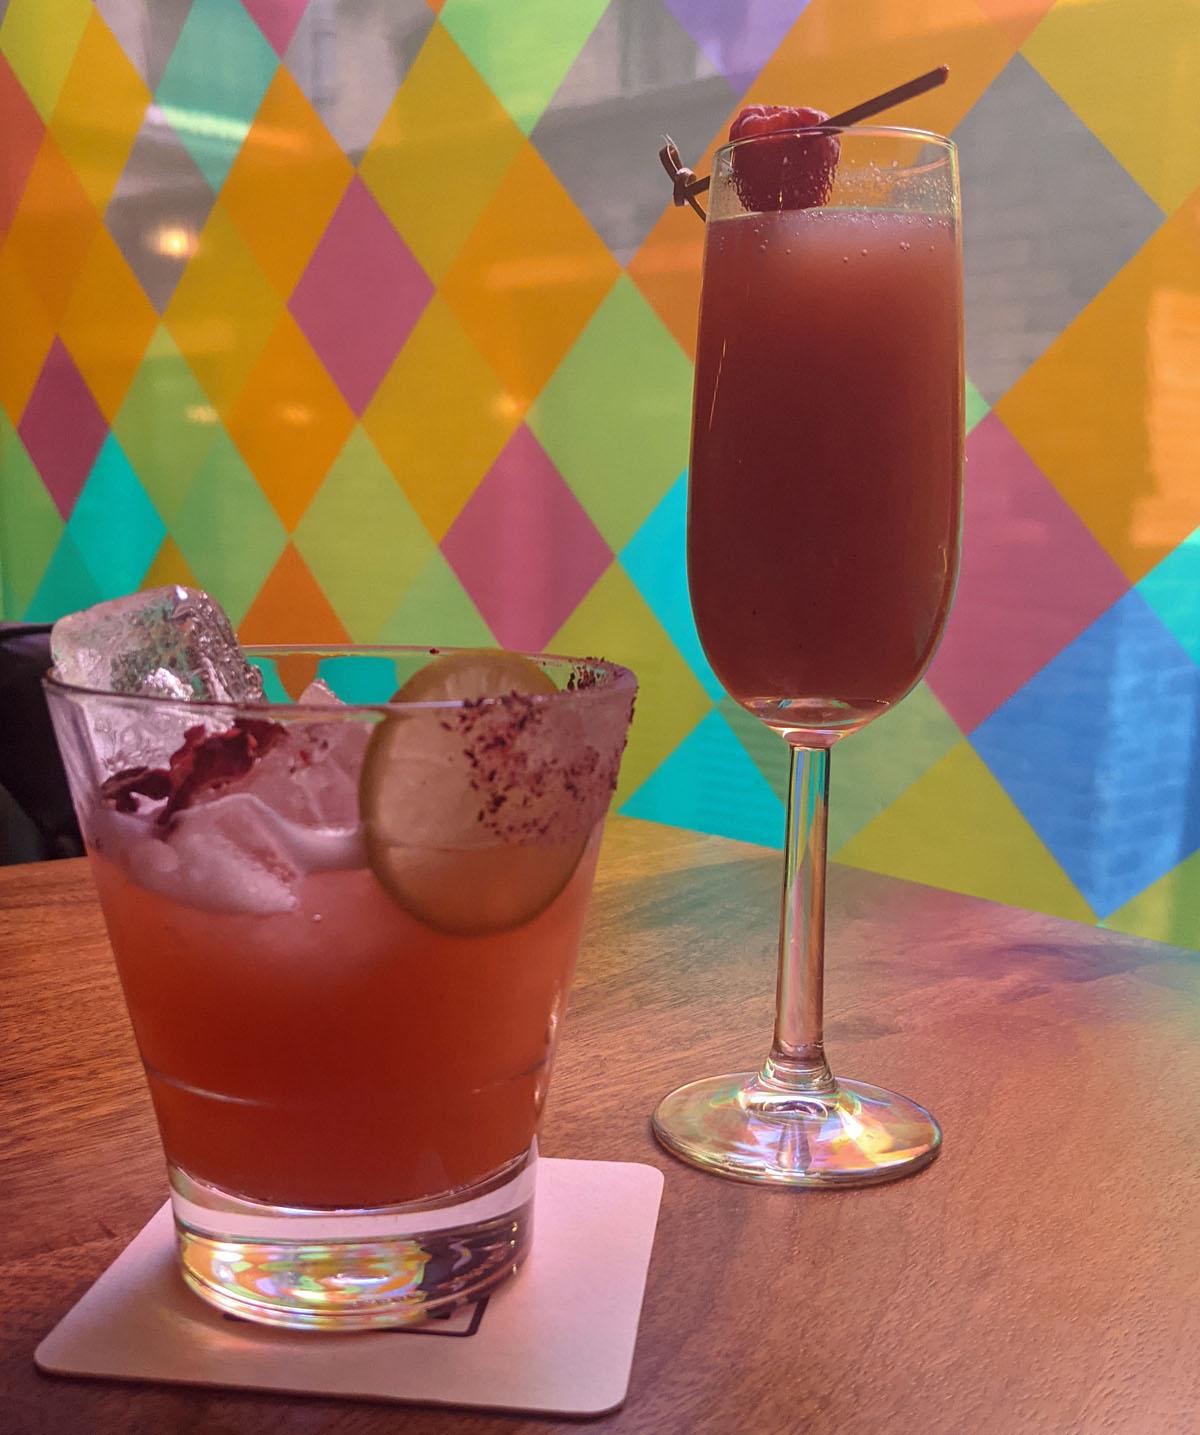 Cocktails - The Last Talisman